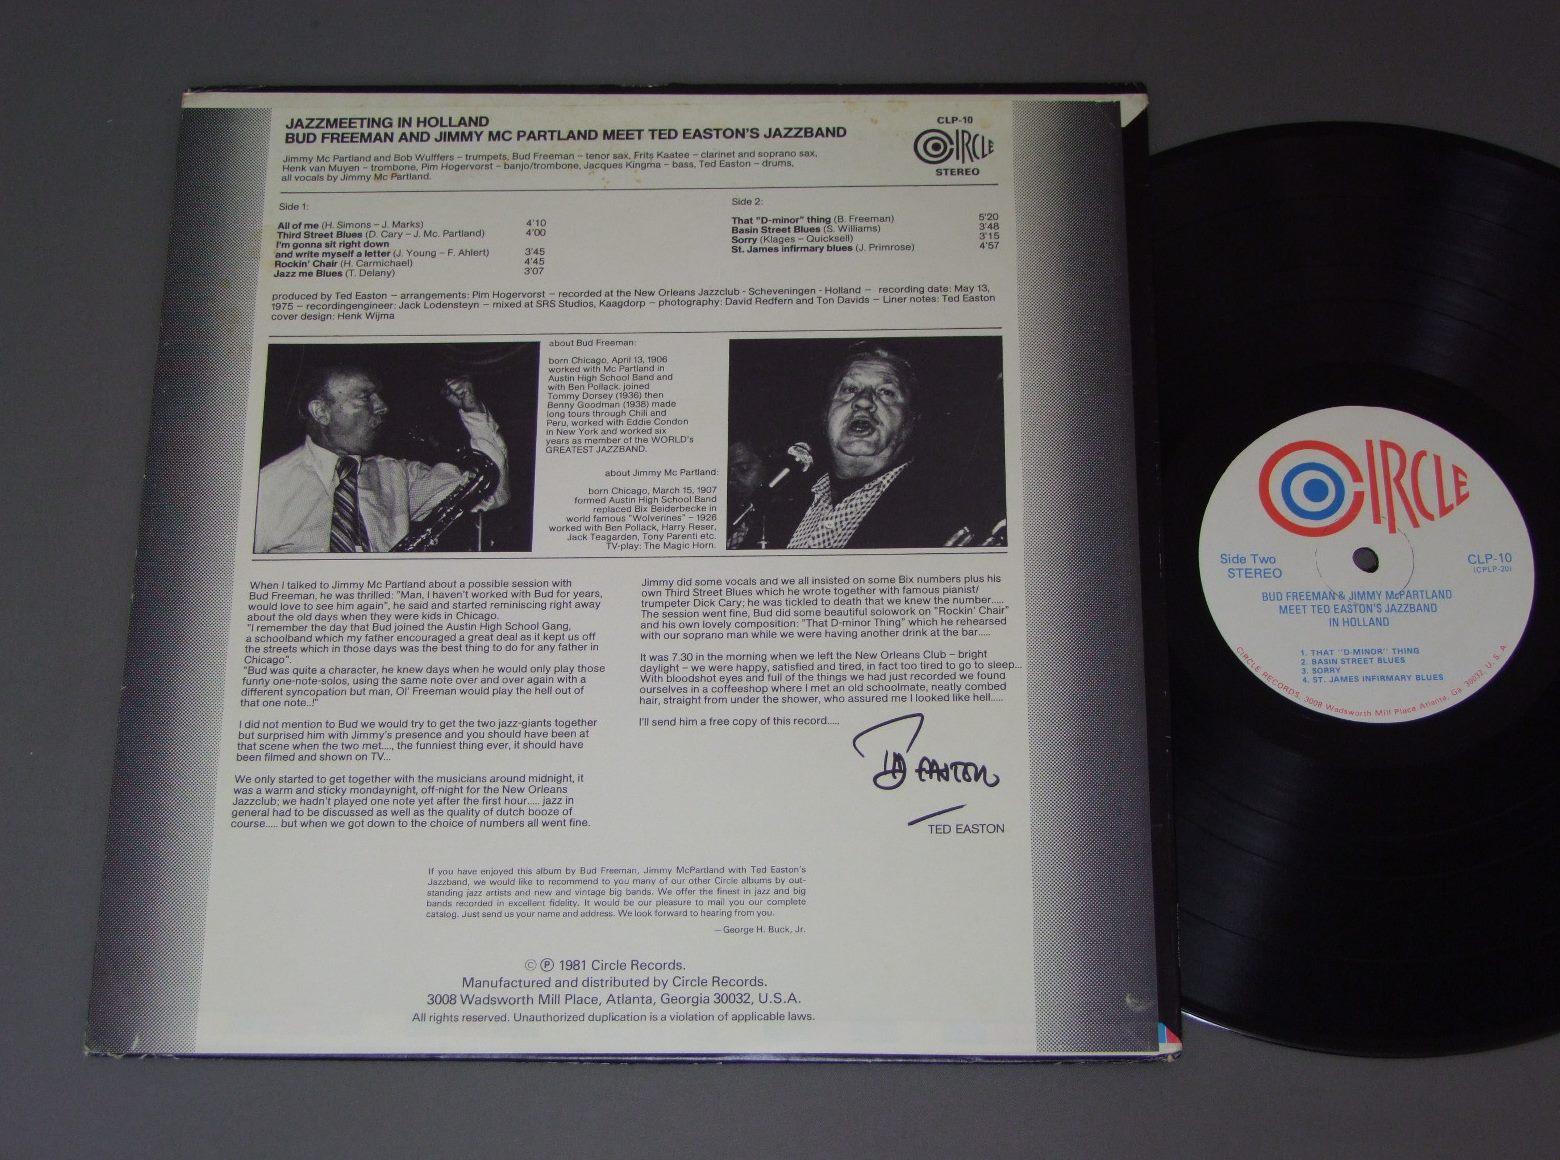 Bud Freeman , Jimmy McPartland* Jimmy Mc Partland·, Ted Easton Jazzband* Ted Easton's Jazz band - Jazzmeeting In Holland